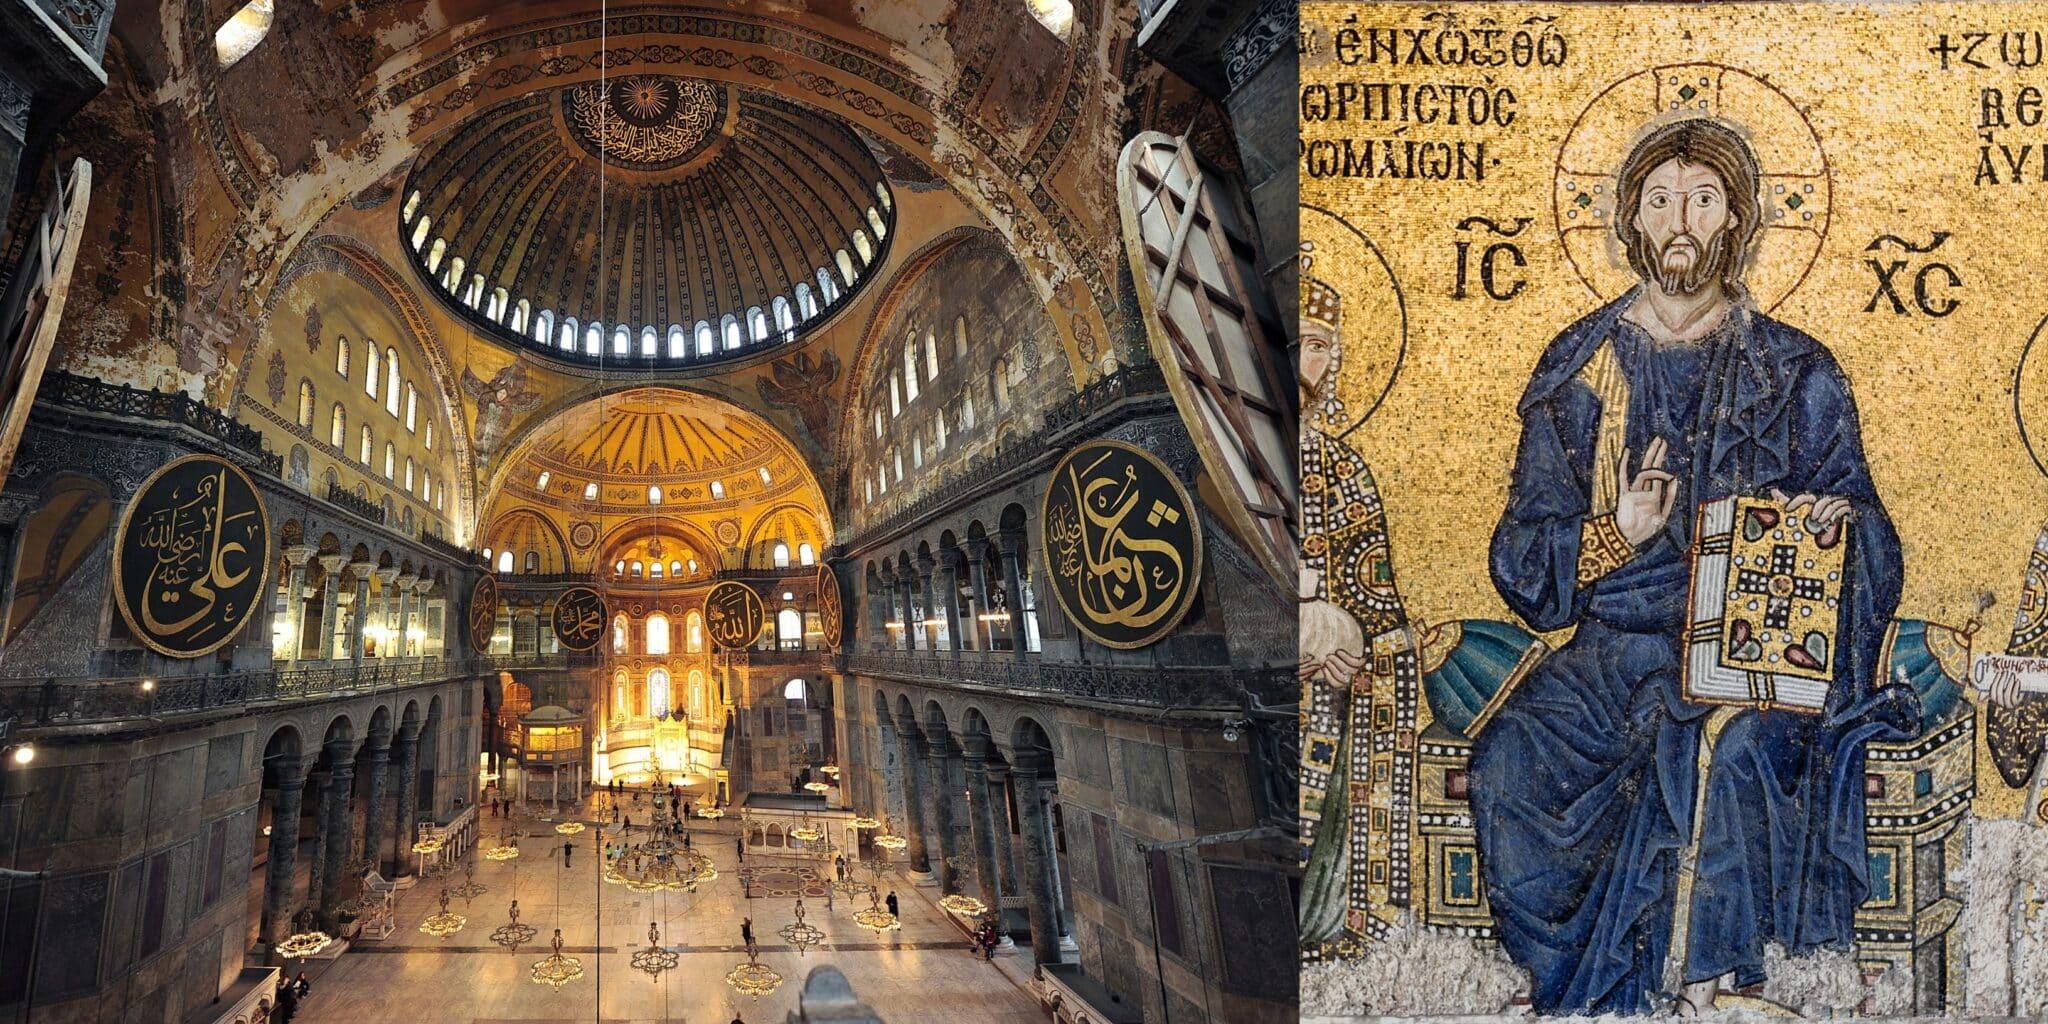 Erdogan parteciper a prima preghiera venerd a Santa Sofia